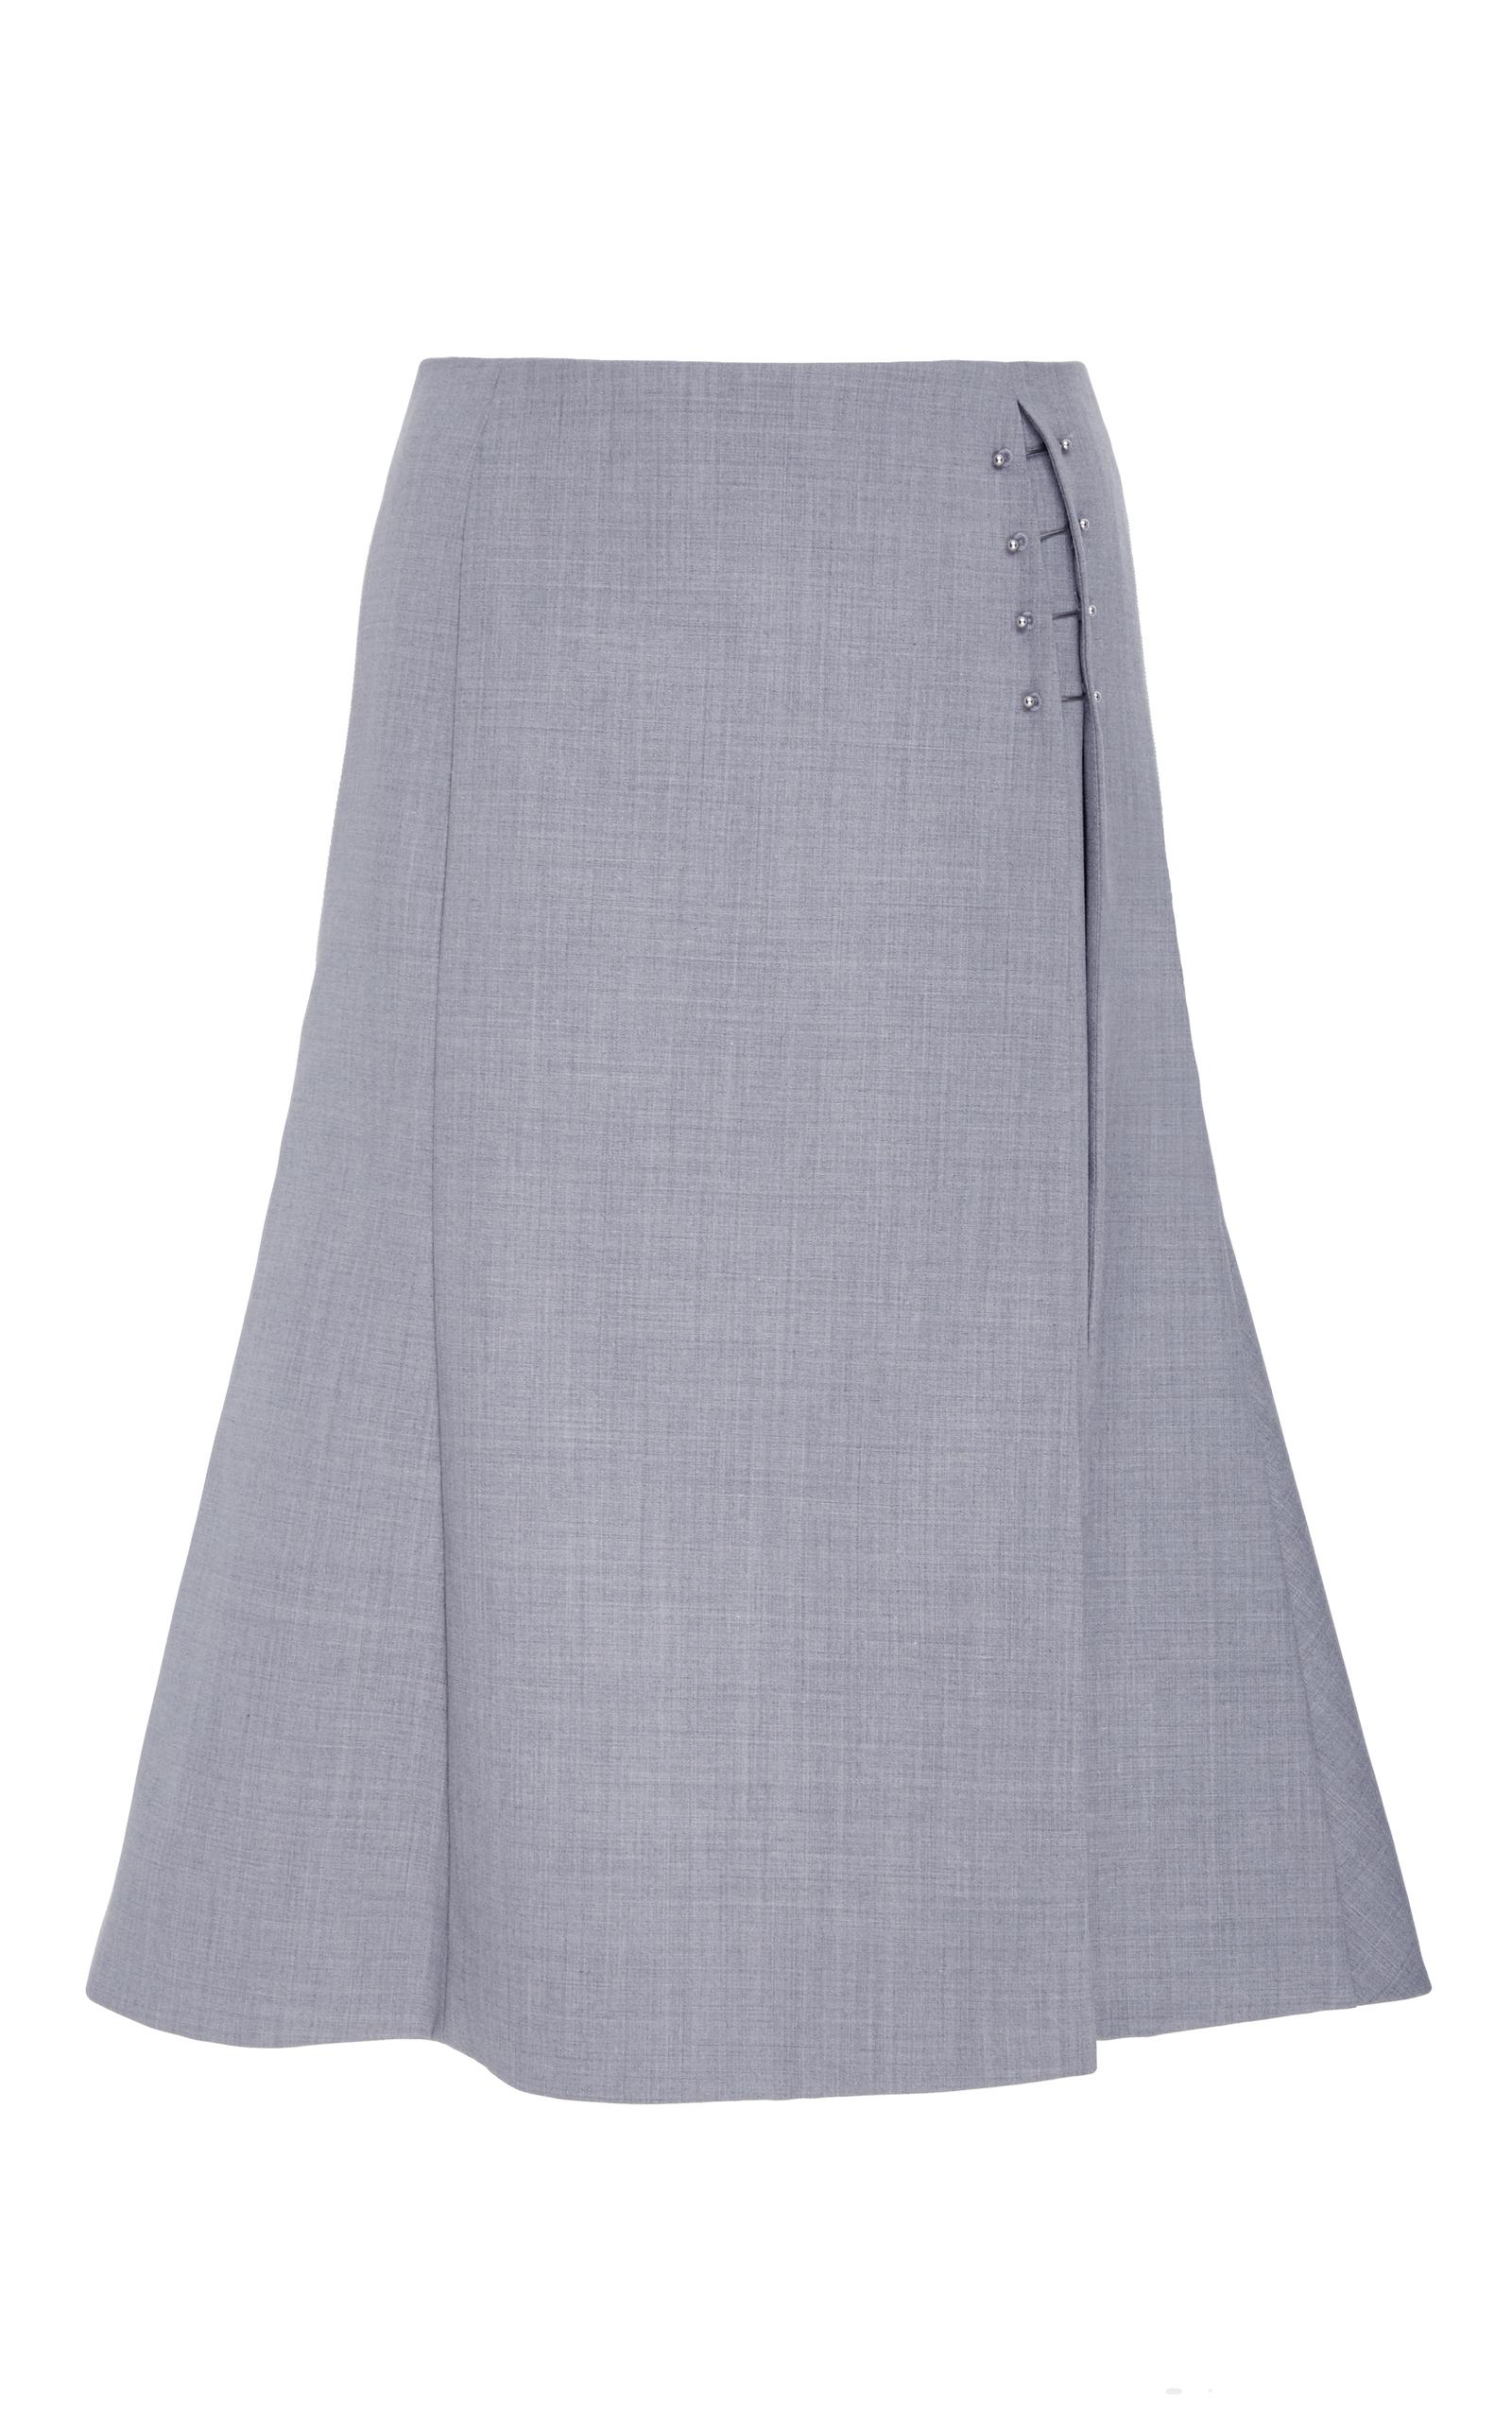 10691f7f93 AdeamSide Slit Flared Skirt. CLOSE. Loading